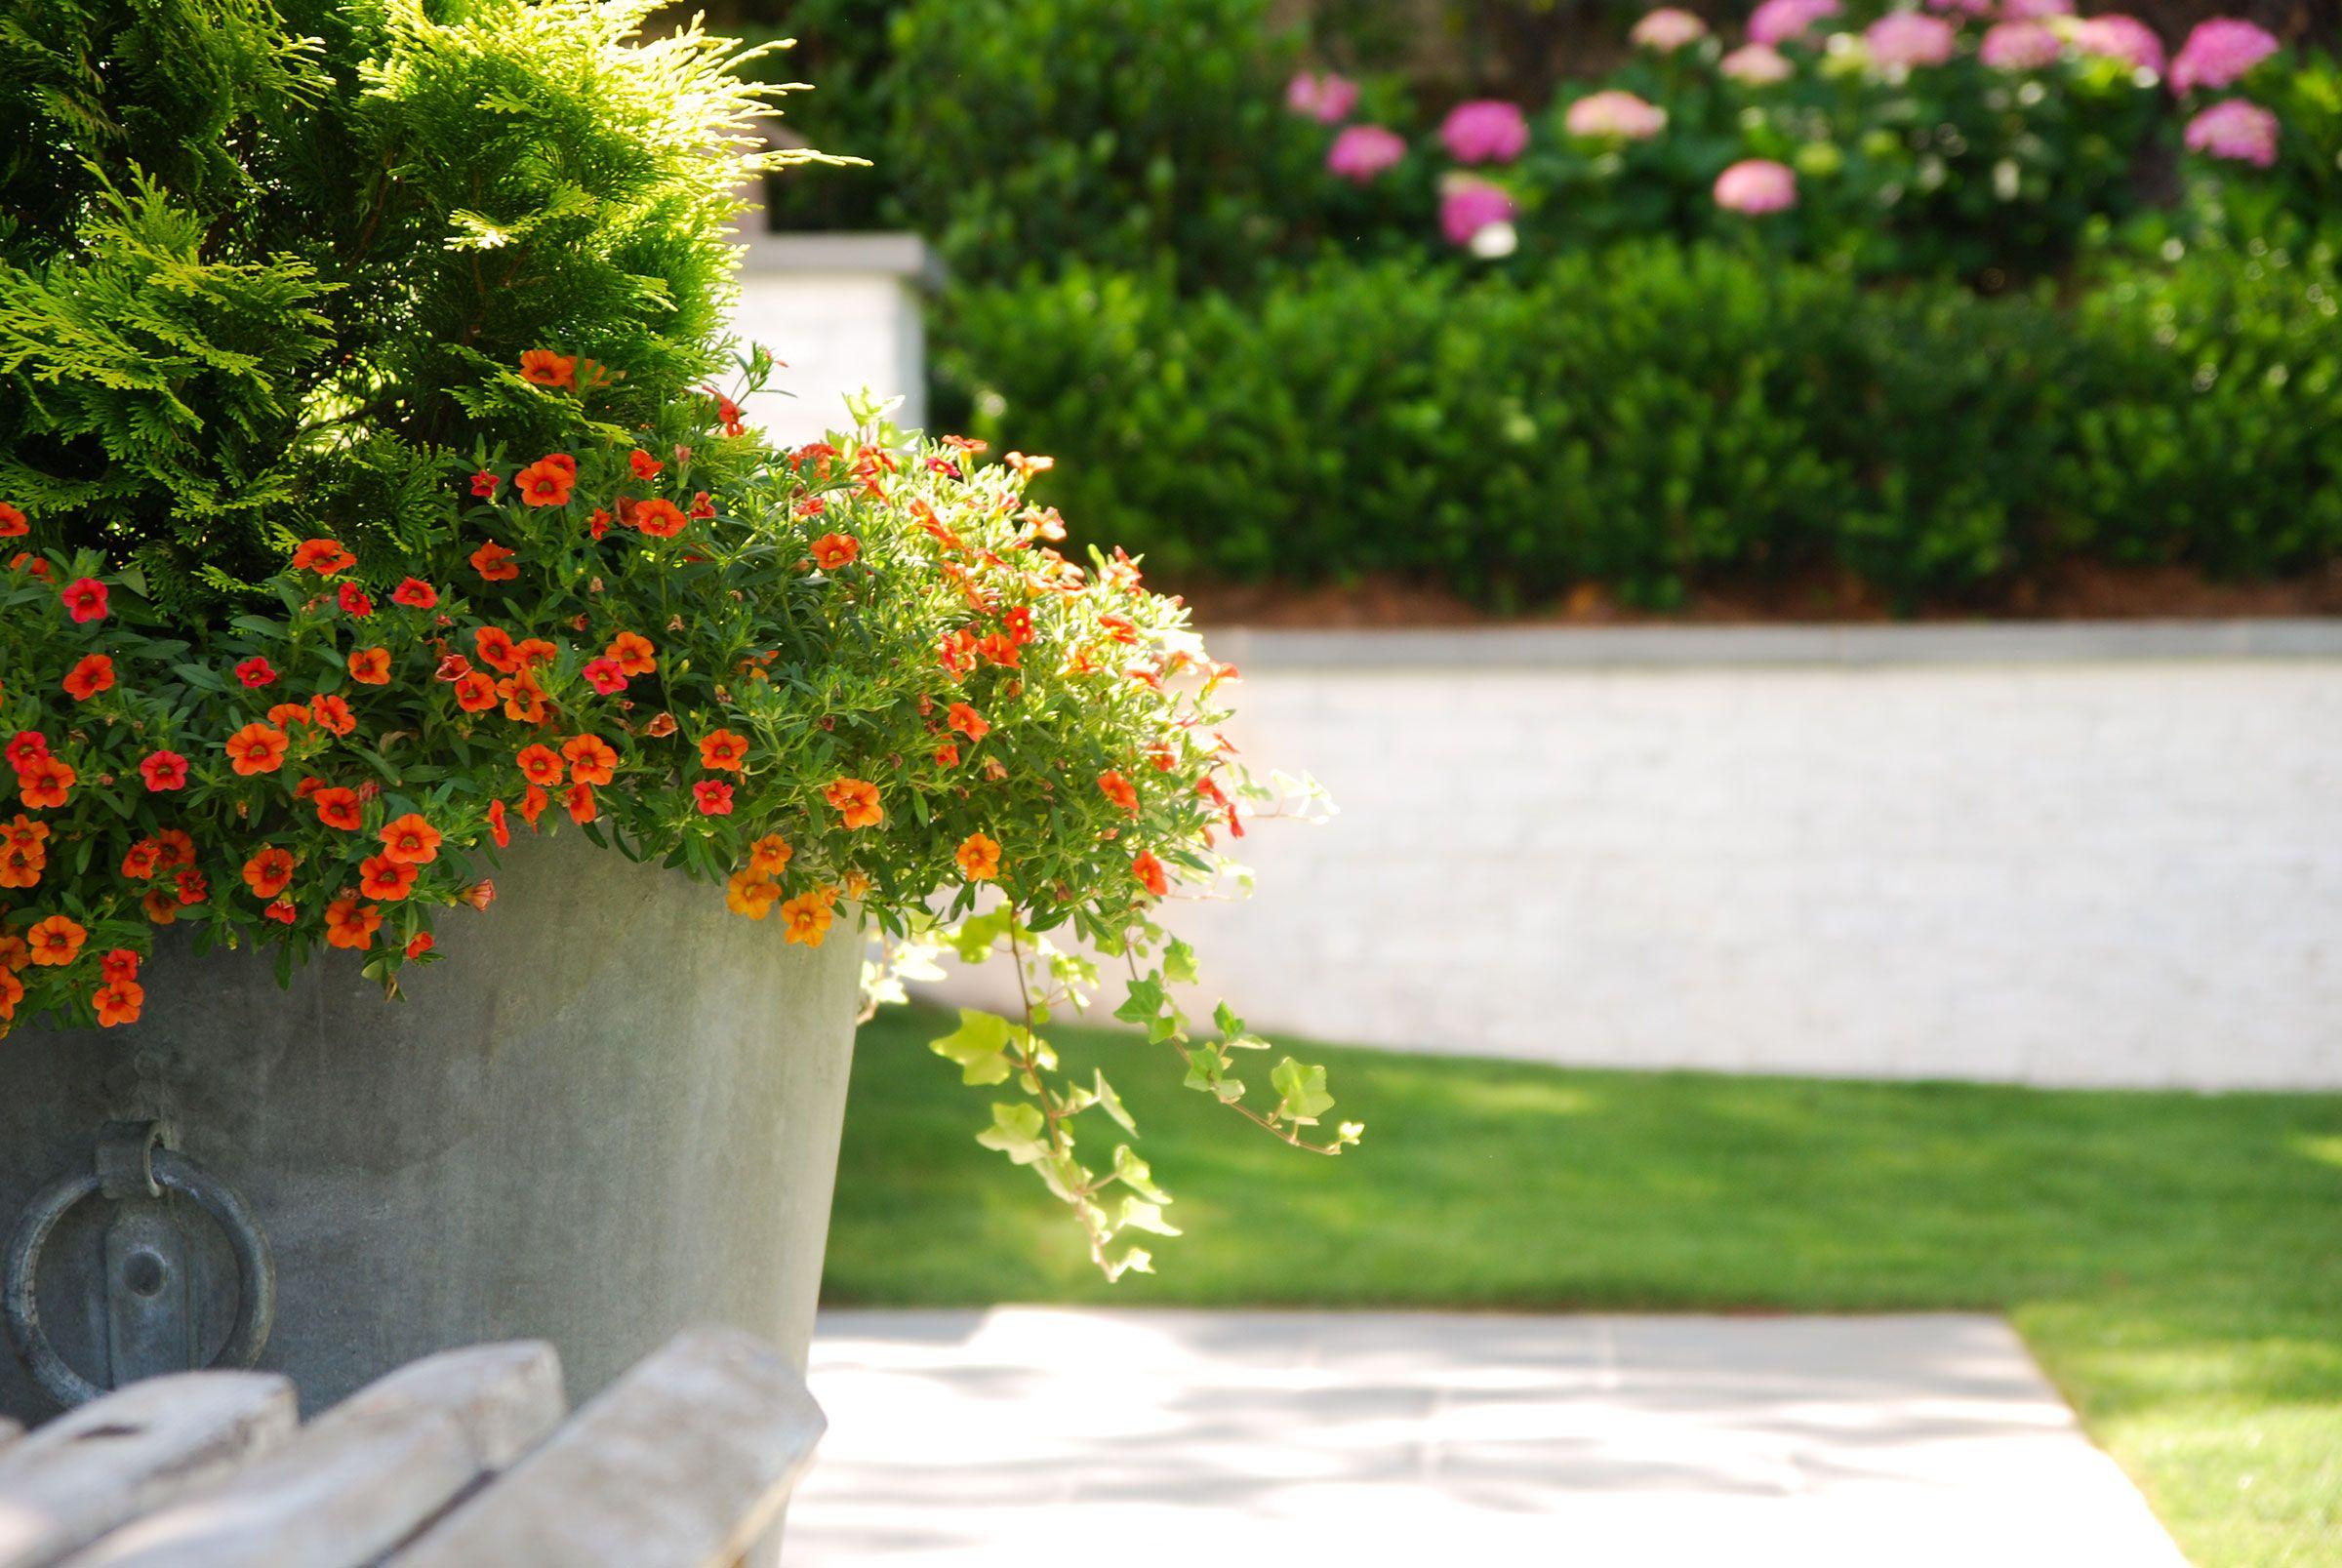 Landscape architect atlanta ga - Bellwether Landscape Architects Atlanta Ga